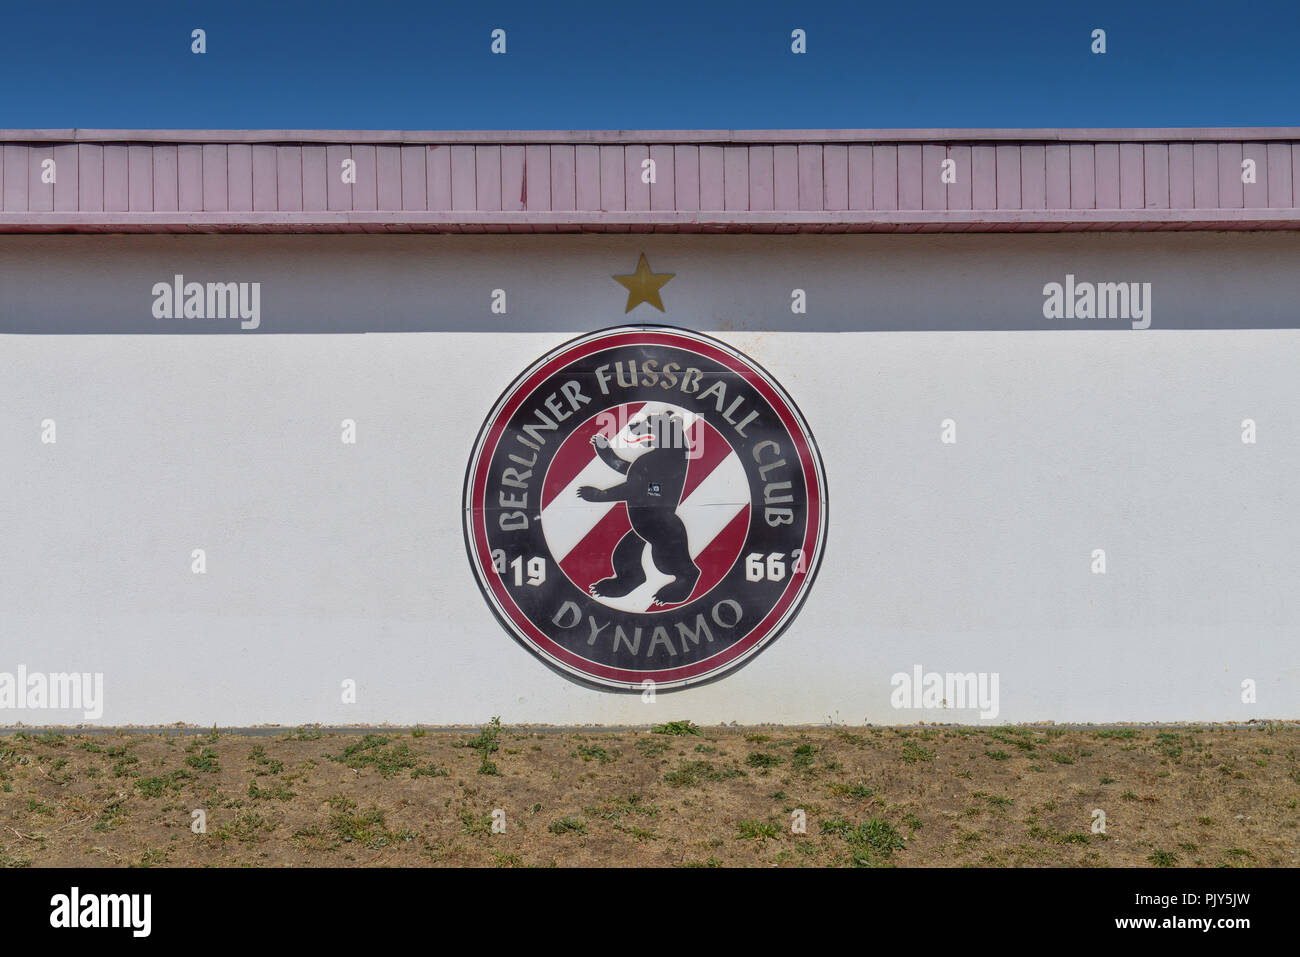 Rostrum, football stadium BFC generator, sports forum Berlin, Weissenseer way, Hohenschoenhausen, bright mountain, Berlin, Germany, Tribuene, Fussball - Stock Image